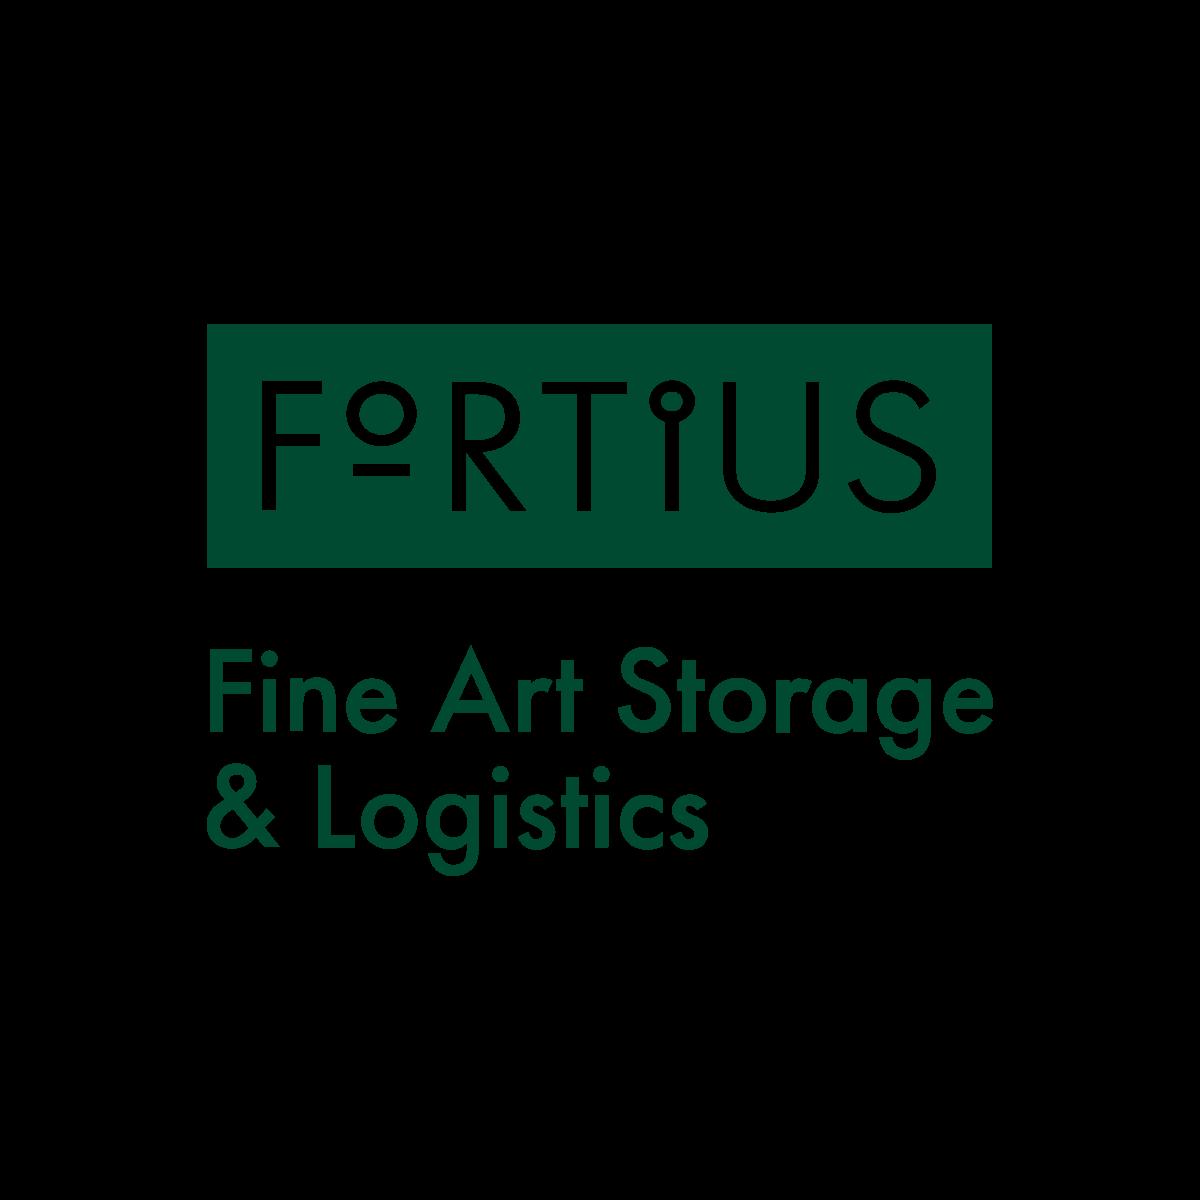 Logo Fortius 1200x1200 no background